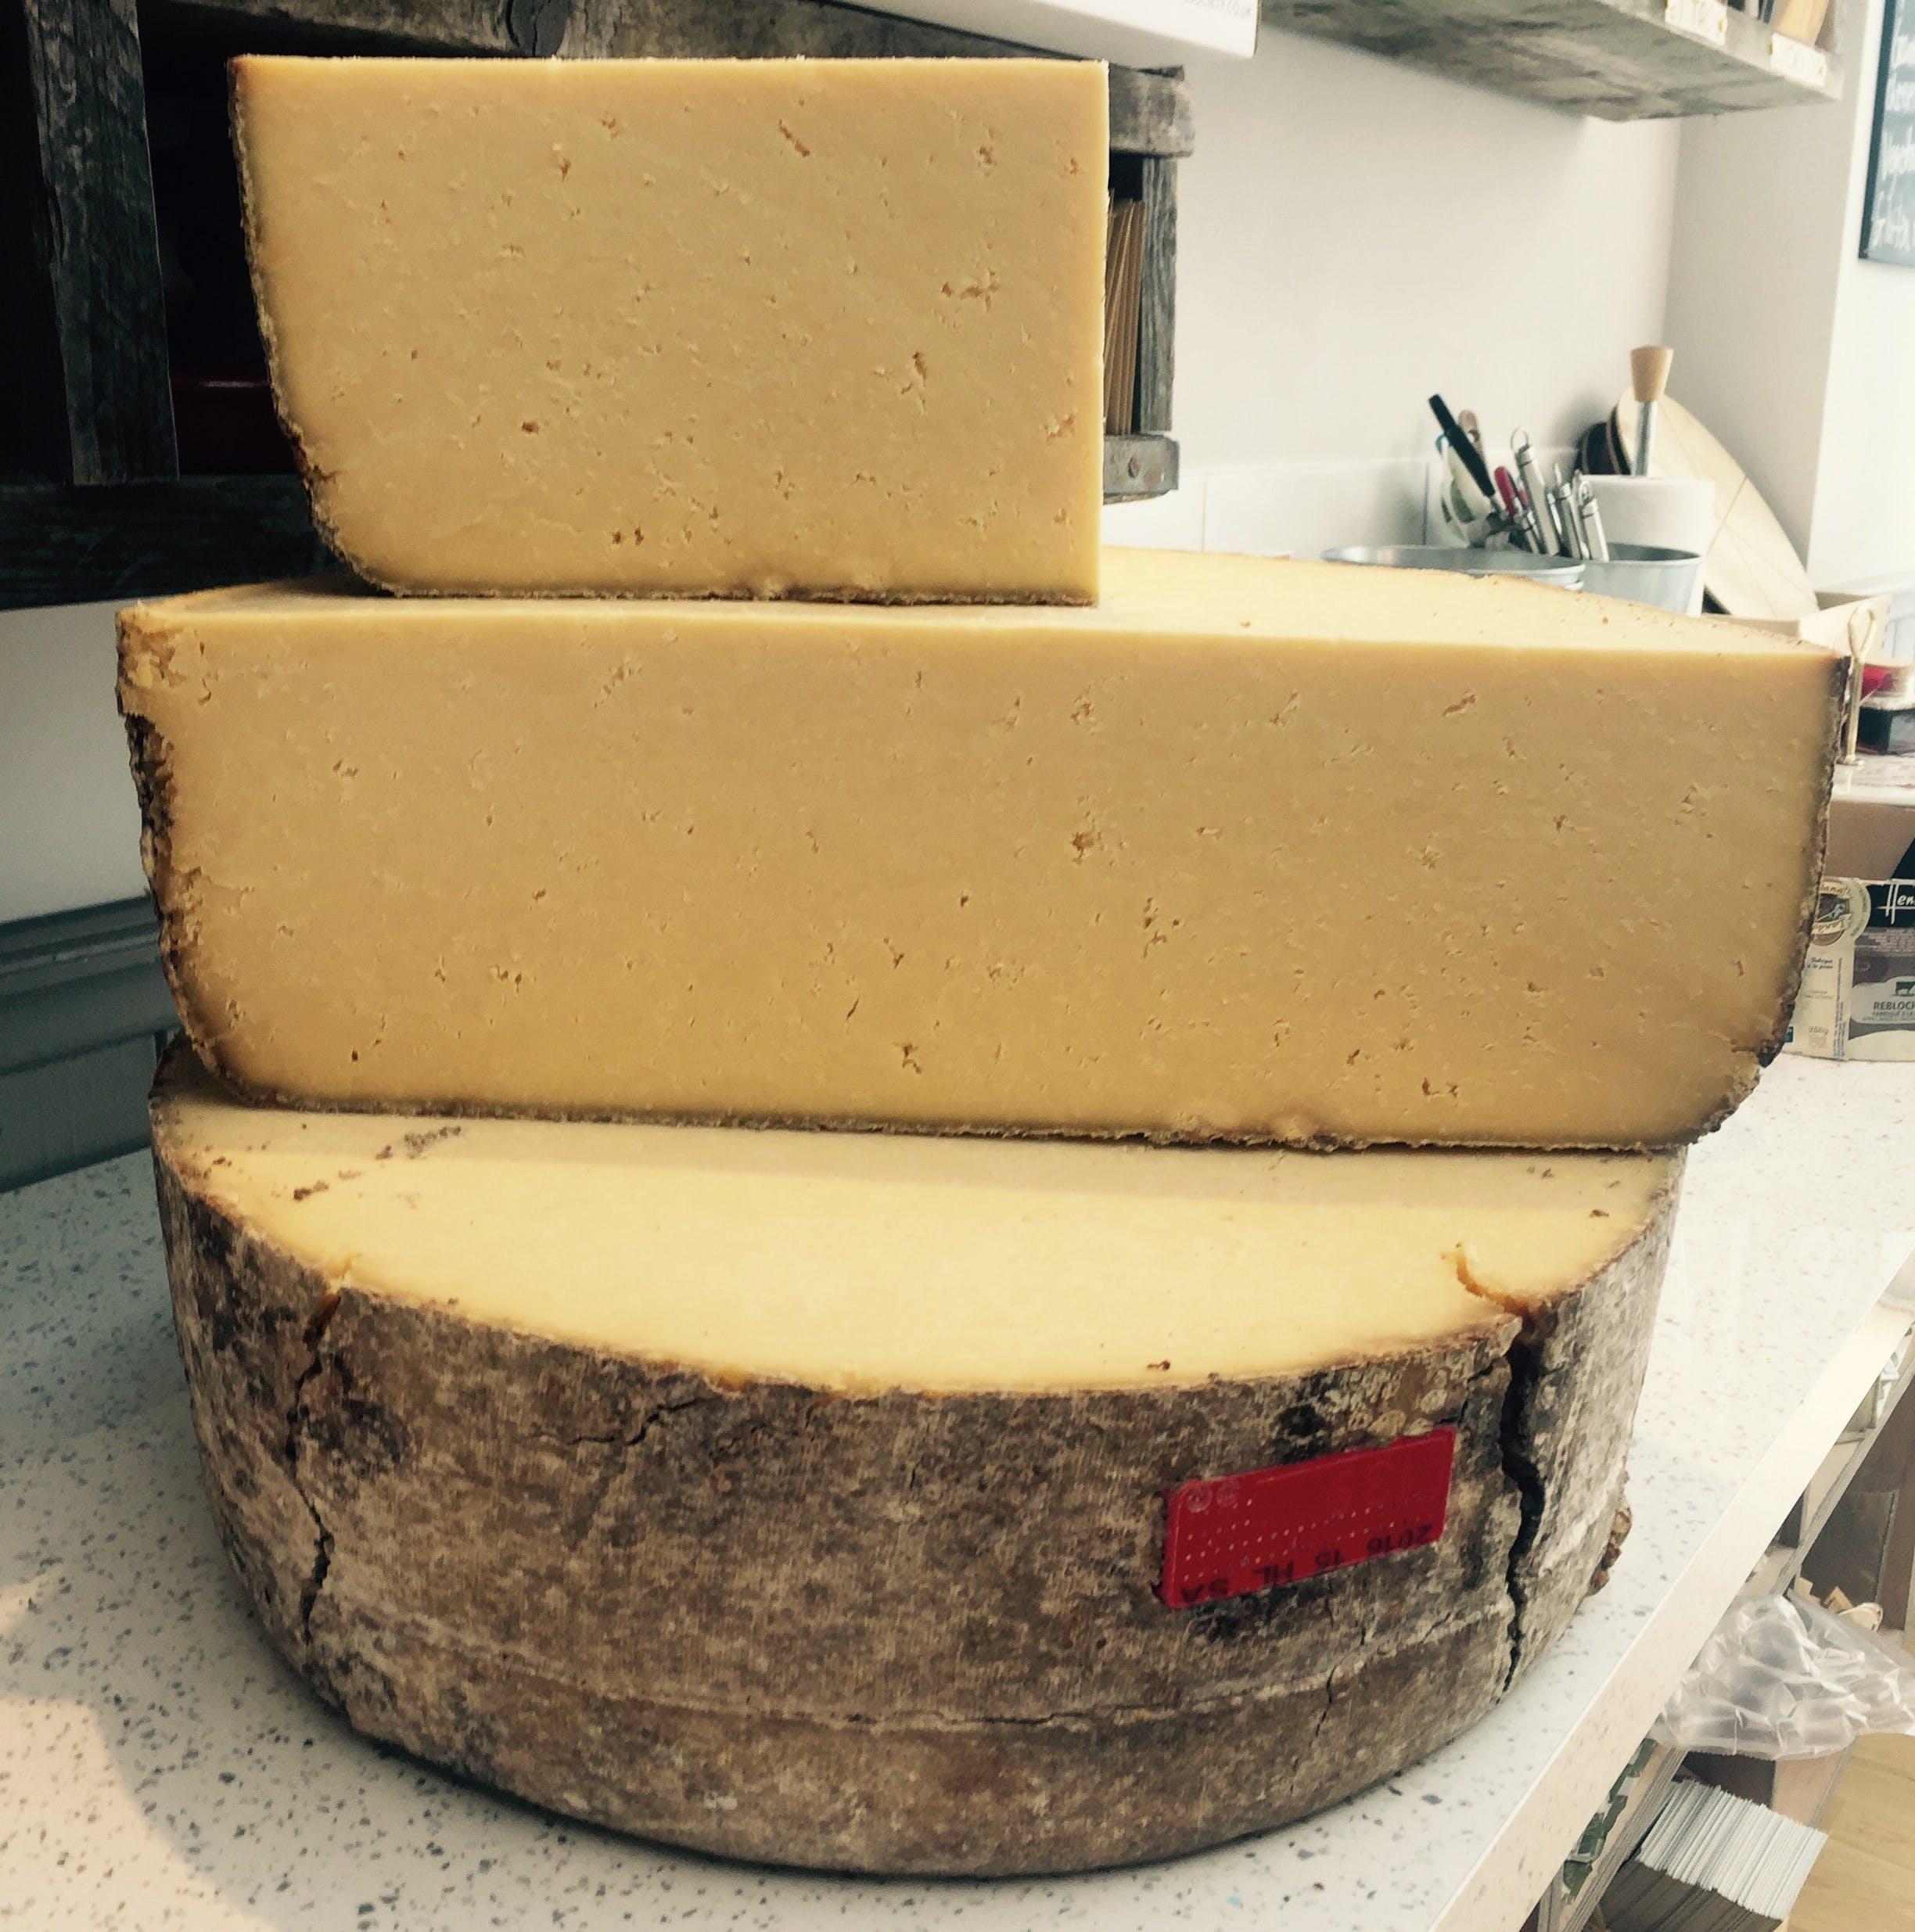 Salers AOC French Farmhouse cheese